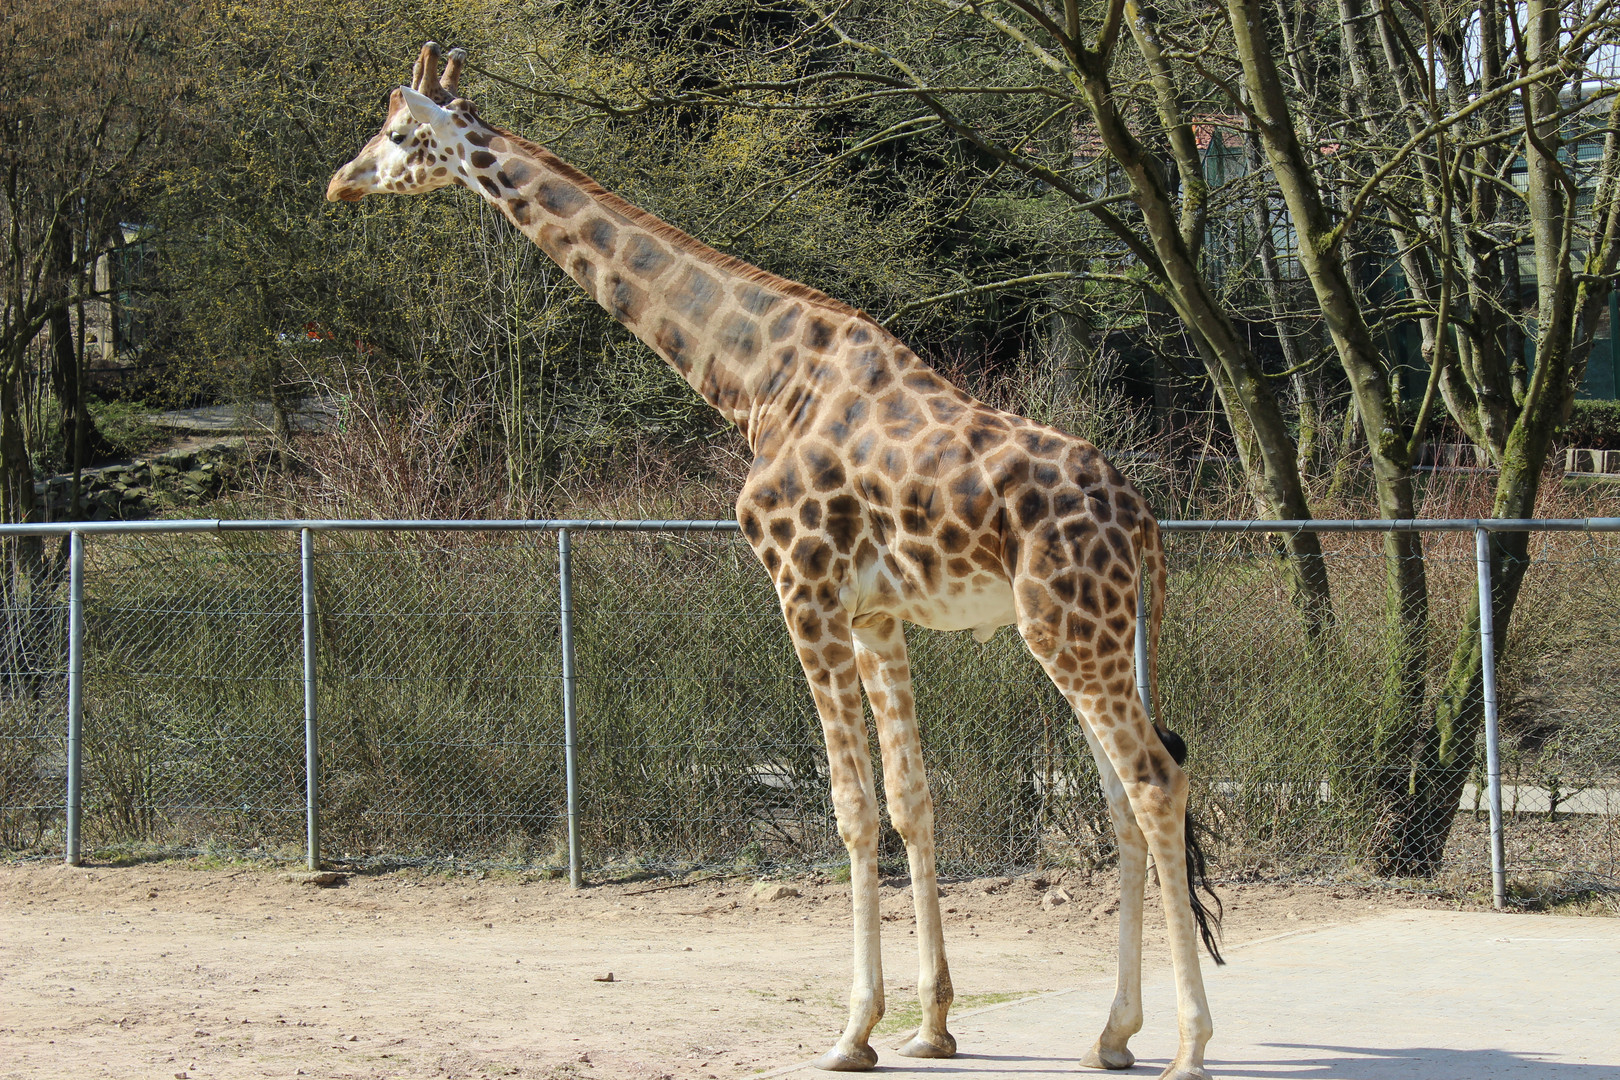 Giraffe im Zoo in Neunkirchen